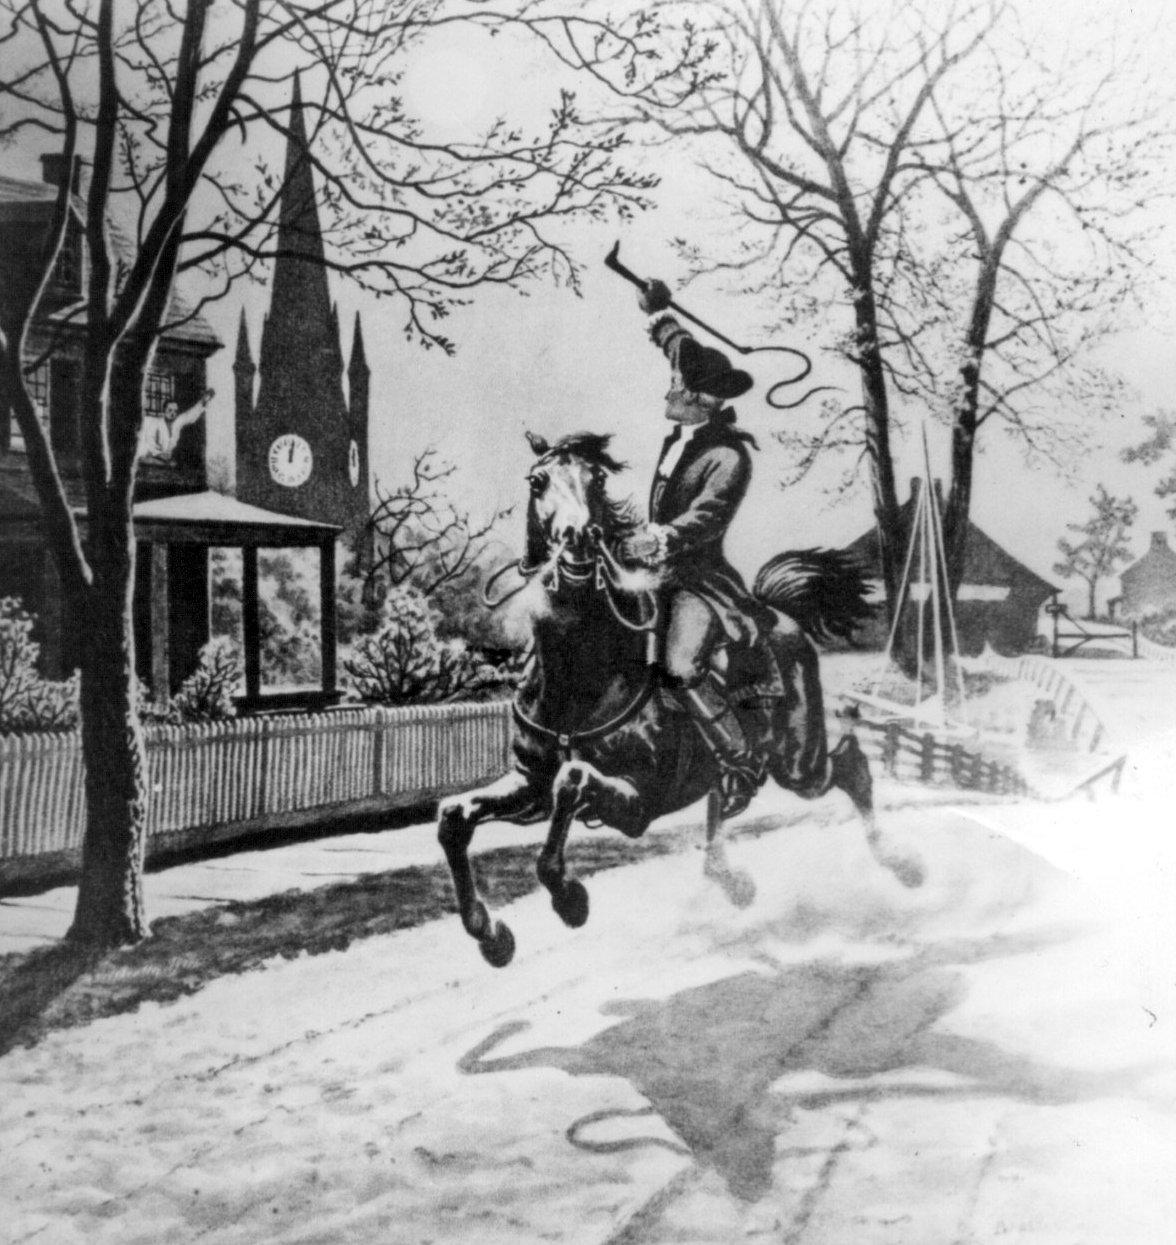 La cabalgata nocturna de Paul Revere